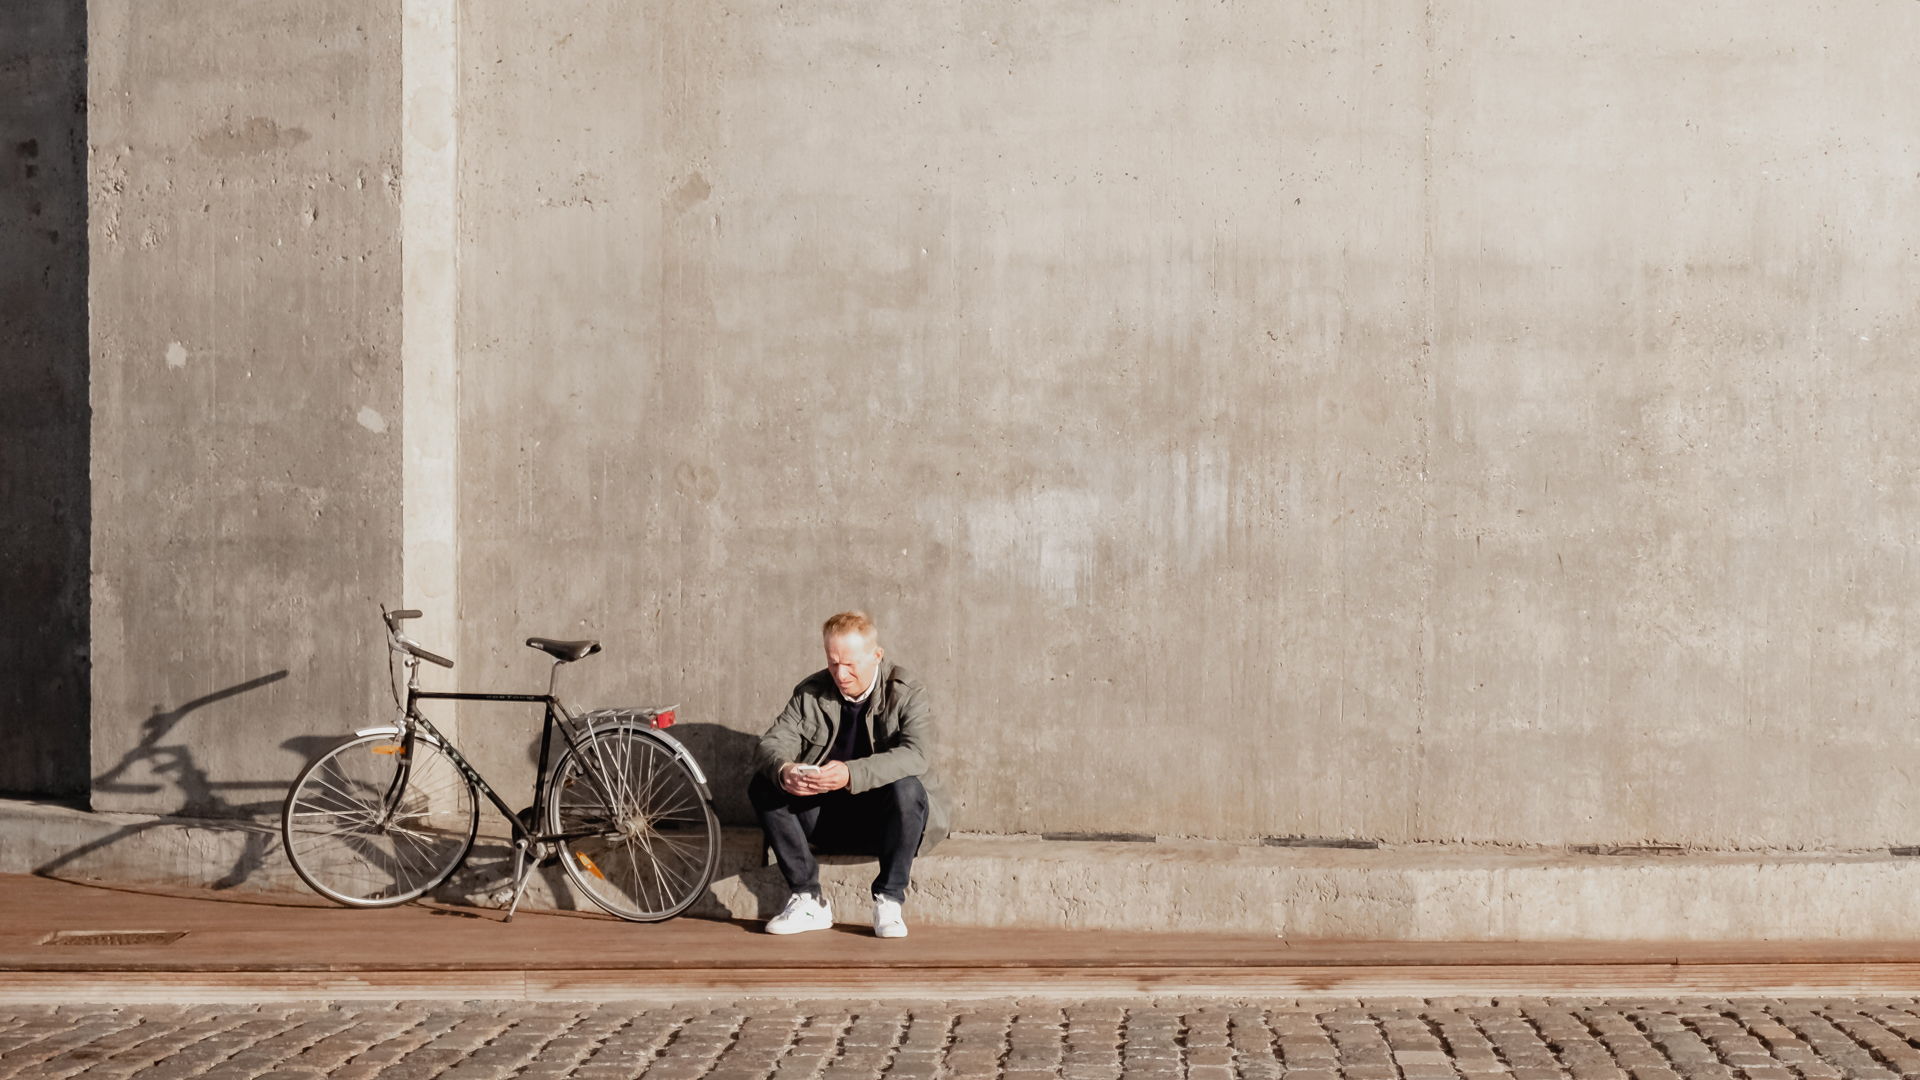 bikerunner